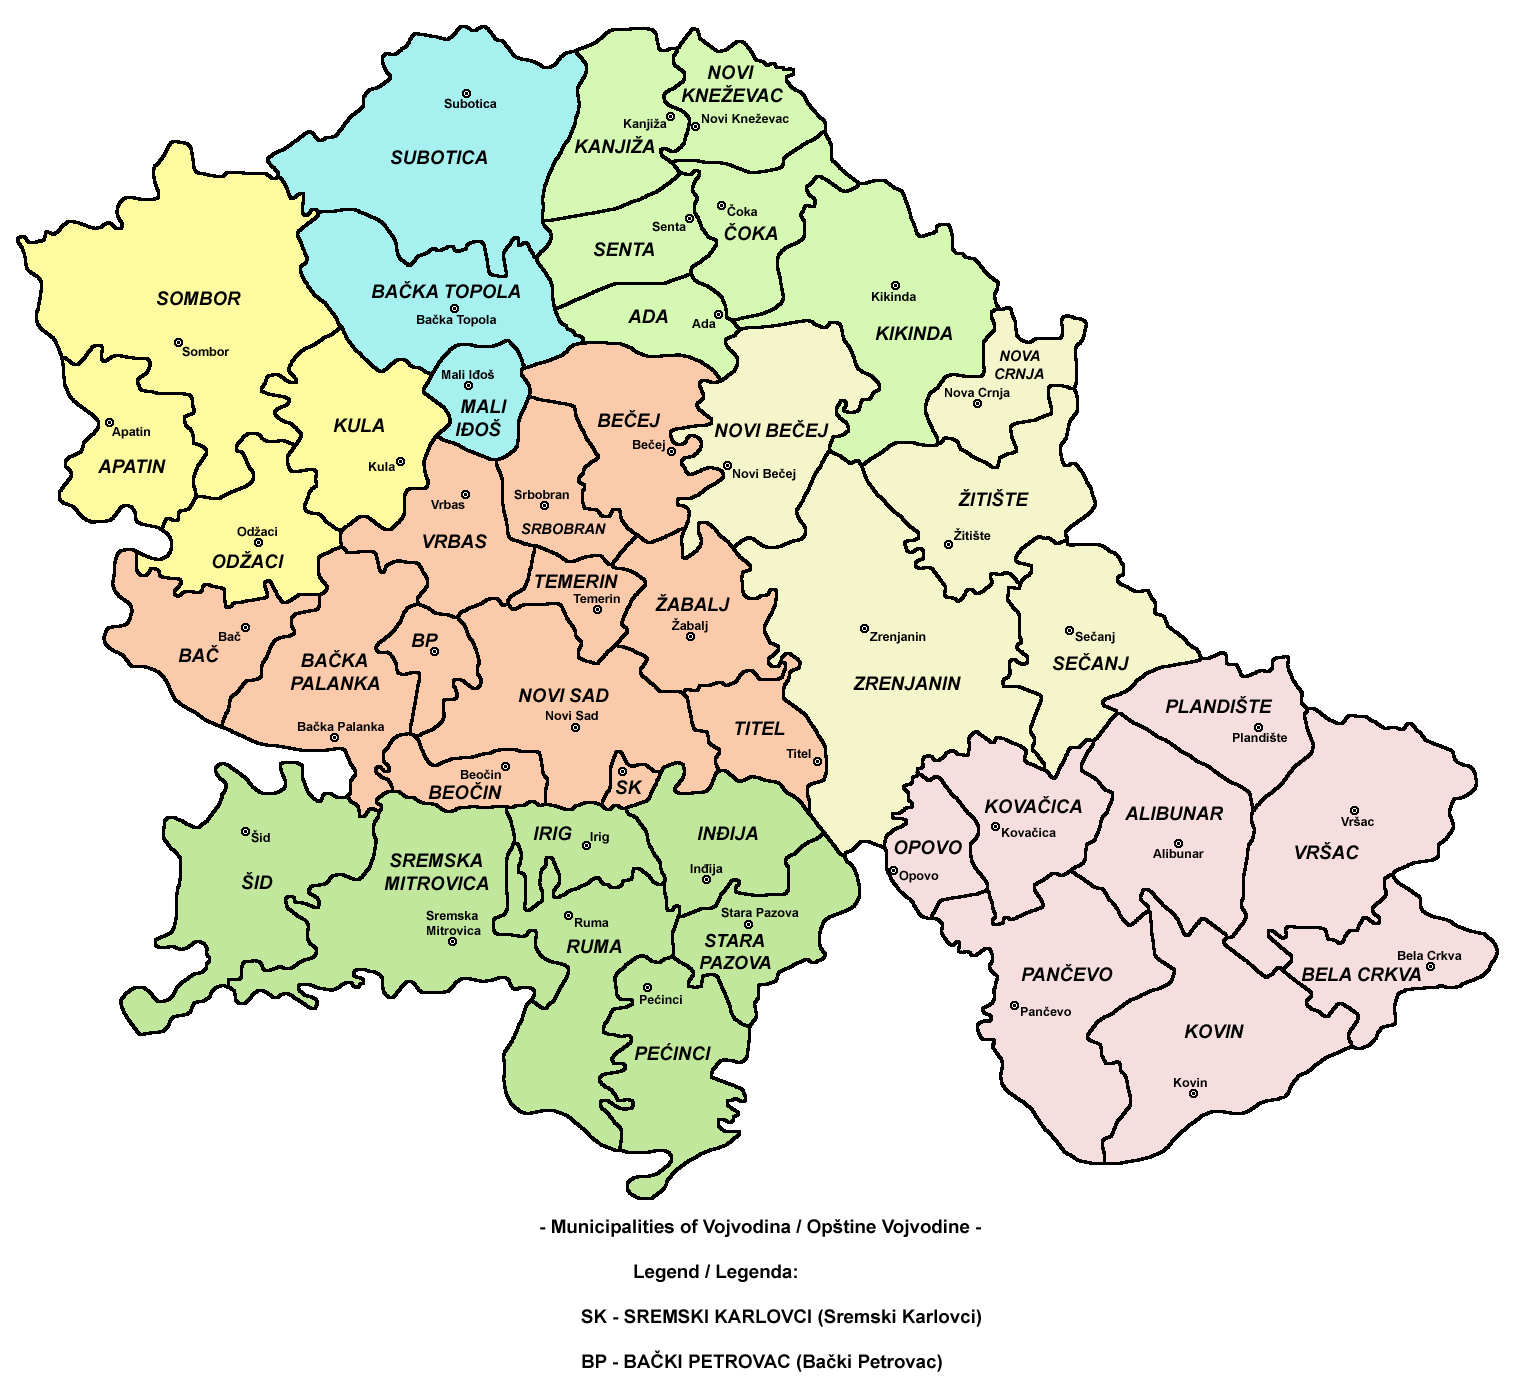 karta vojvodine po opstinama Ohne Titel   Worldnews.com karta vojvodine po opstinama